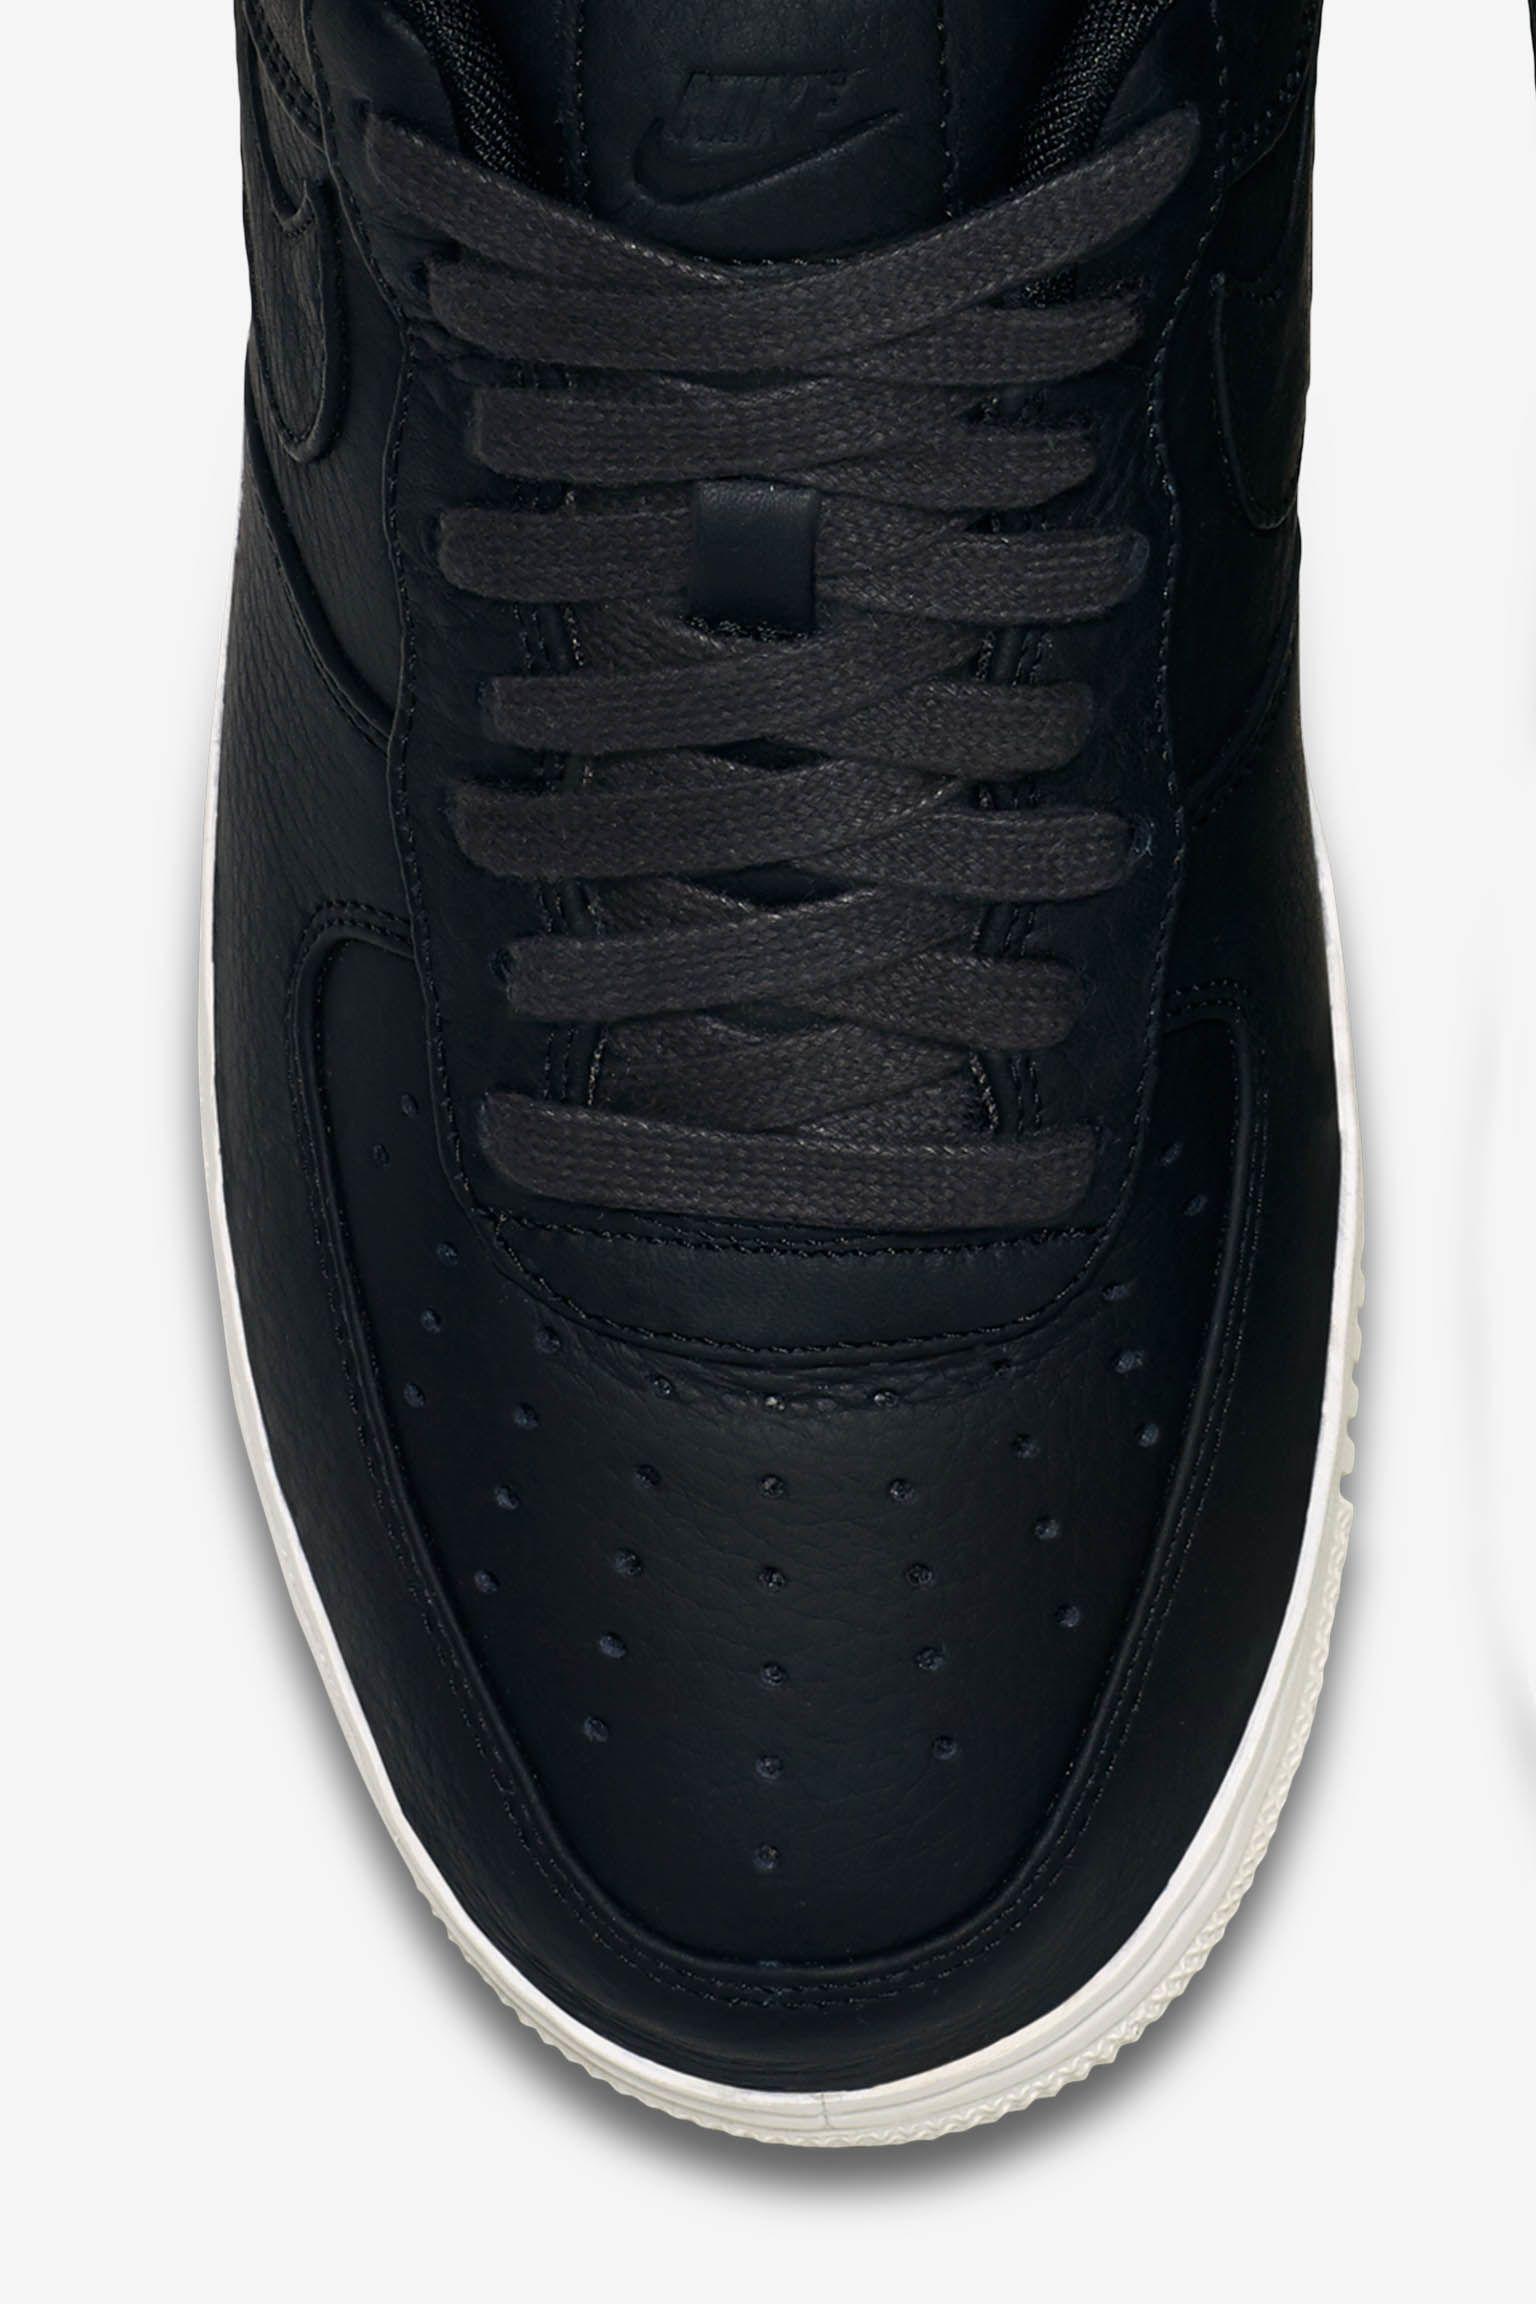 NikeLab Air Force 1 Low 'Black & Sail''